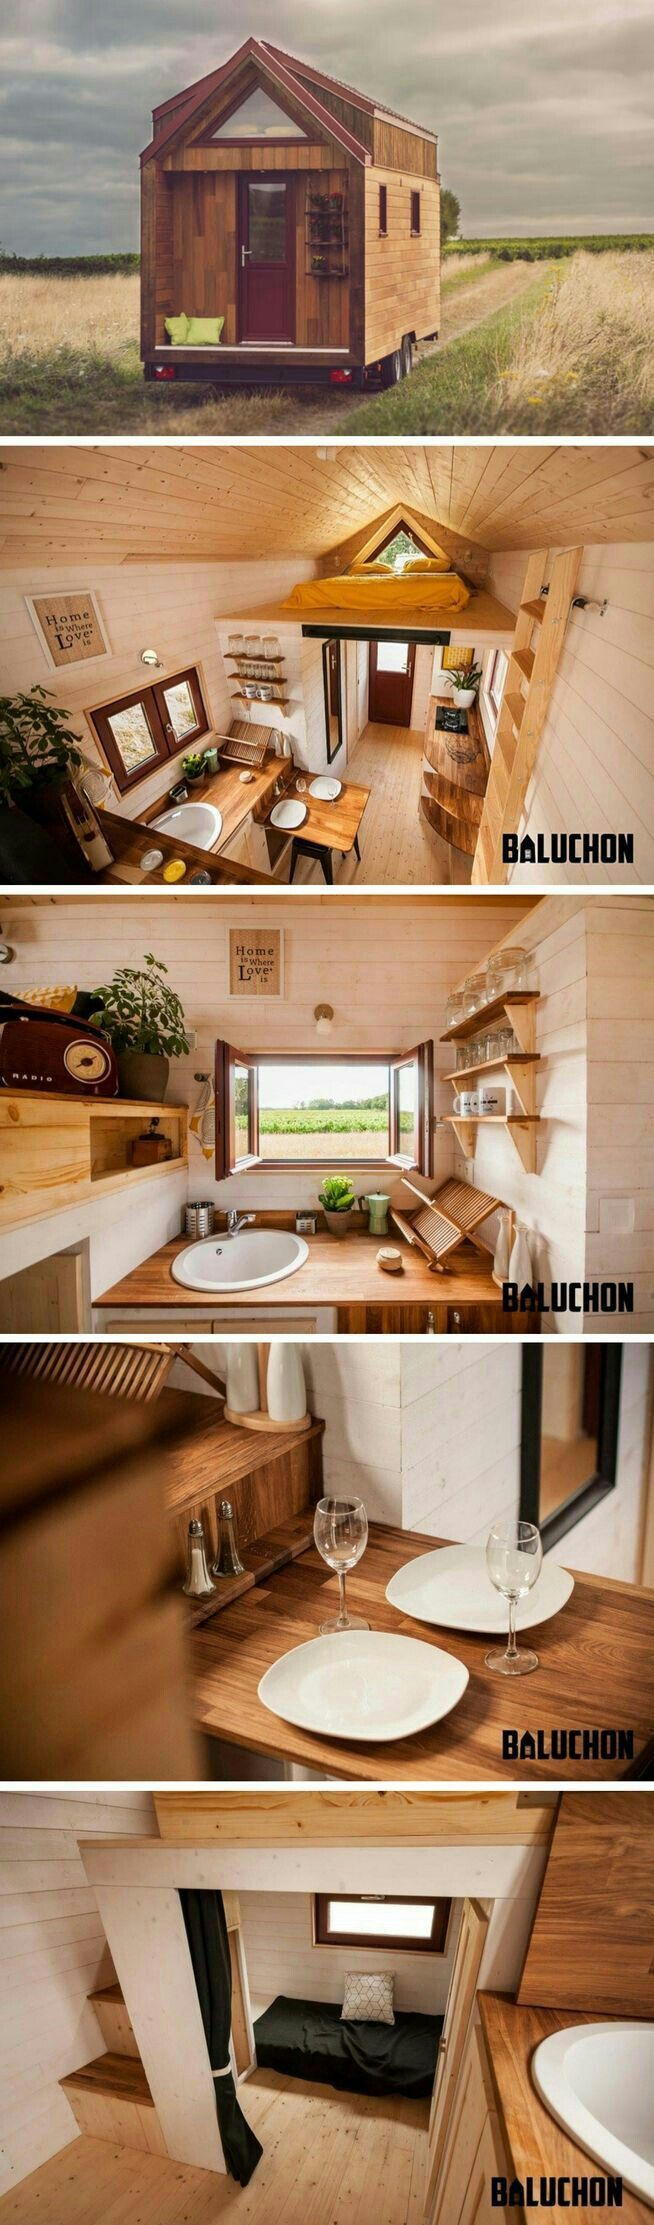 873 best Tiny houses images on Pinterest | Tiny house living, Tiny ...